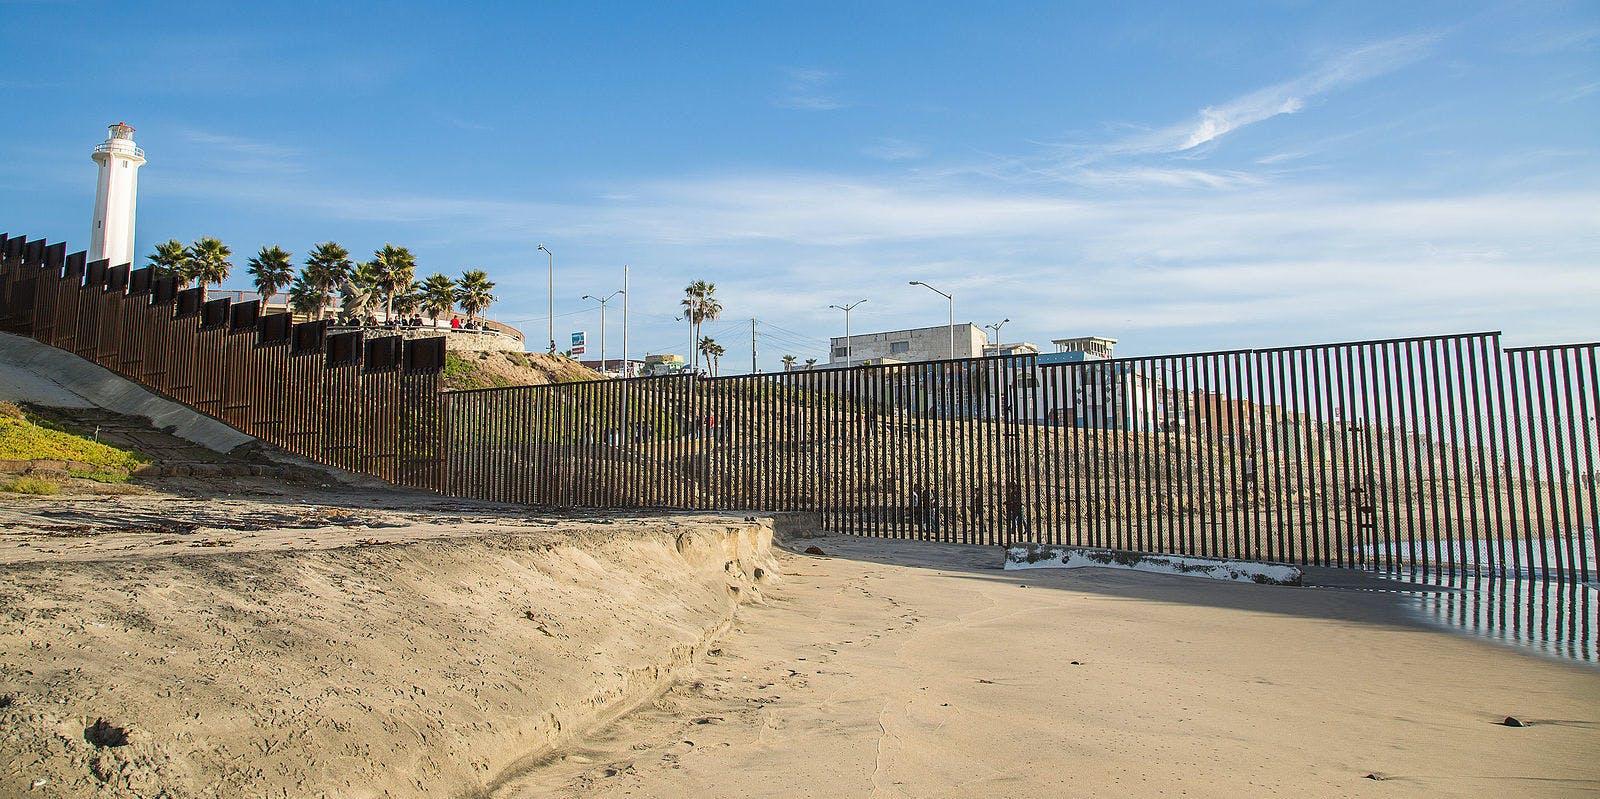 The border alongside the Pacific Ocean.